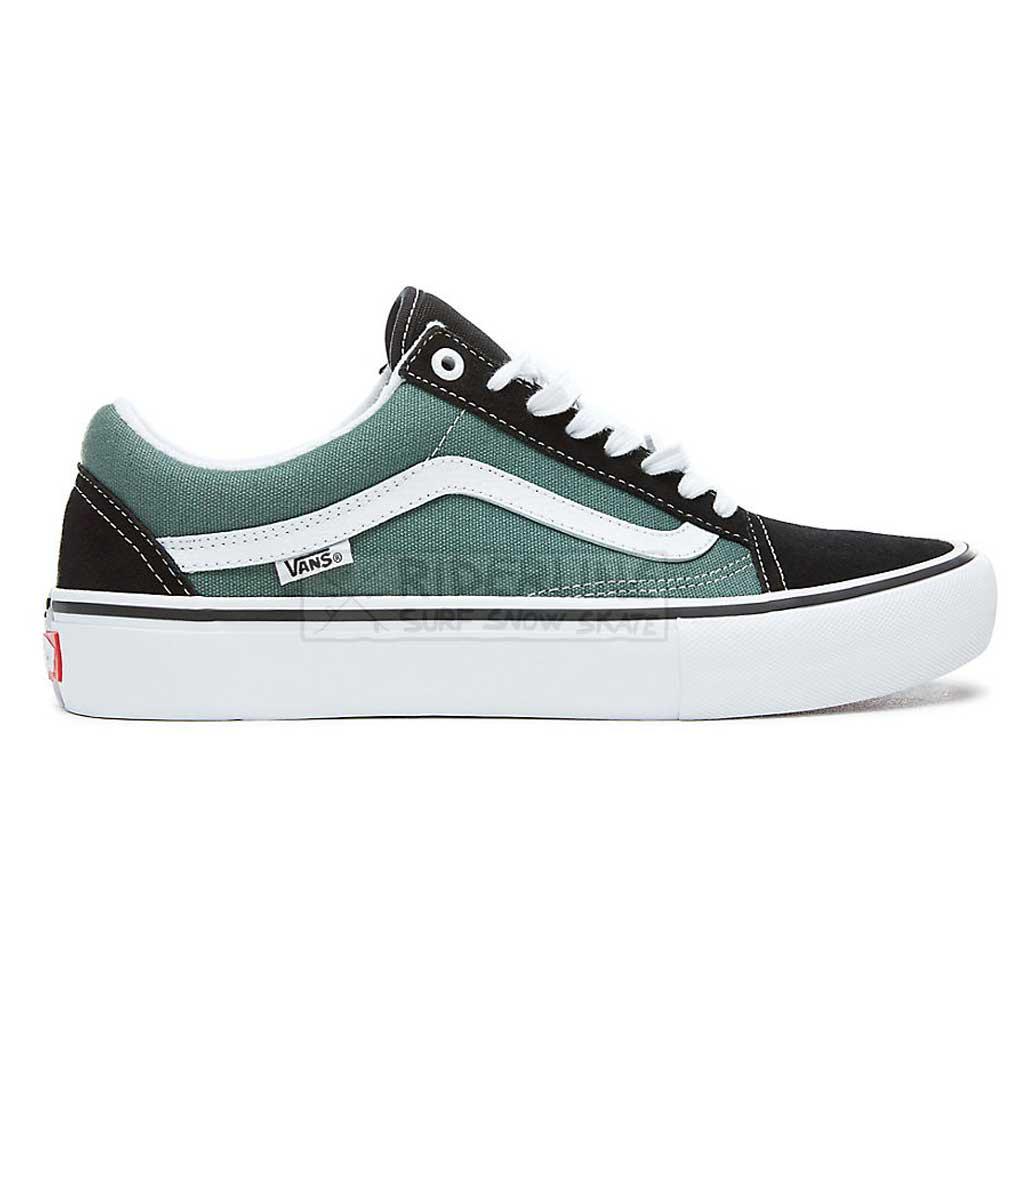 Store Duck Green Vans Scarpe Old Latina Black Riderline Skool Pro Xv8x4q 7c428b3a70f